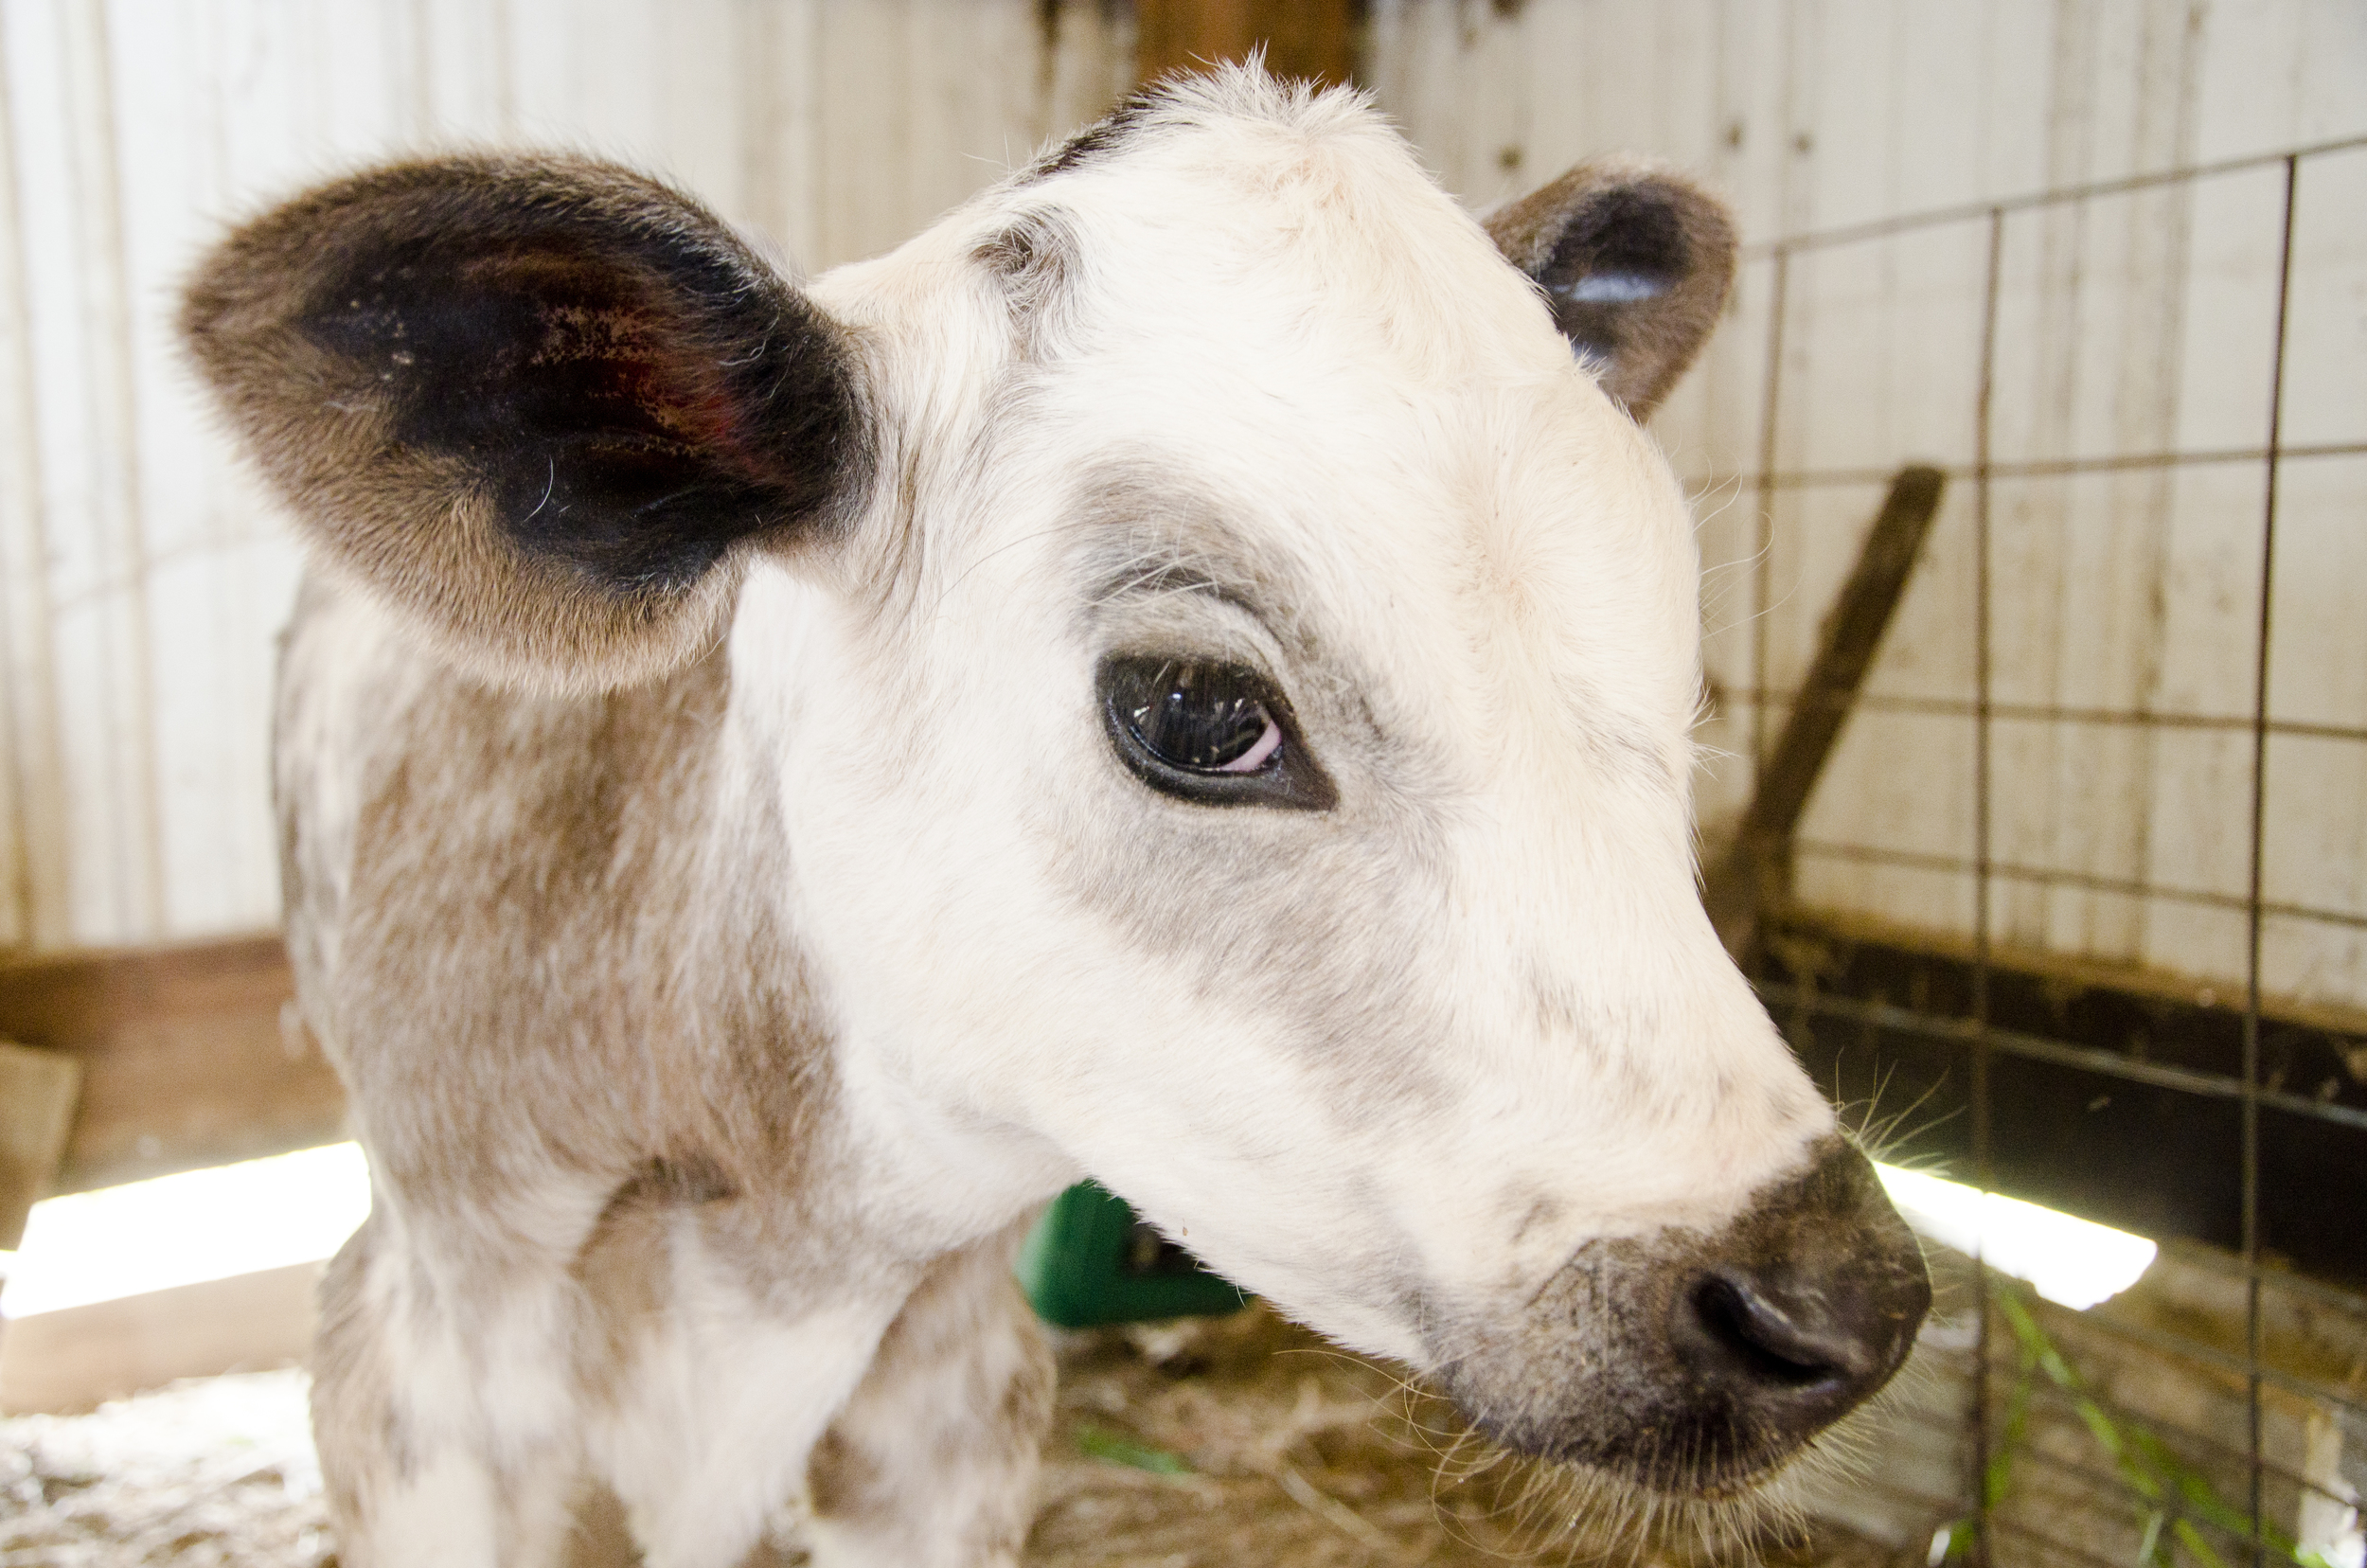 Happy cows live at Snowville Creamery.